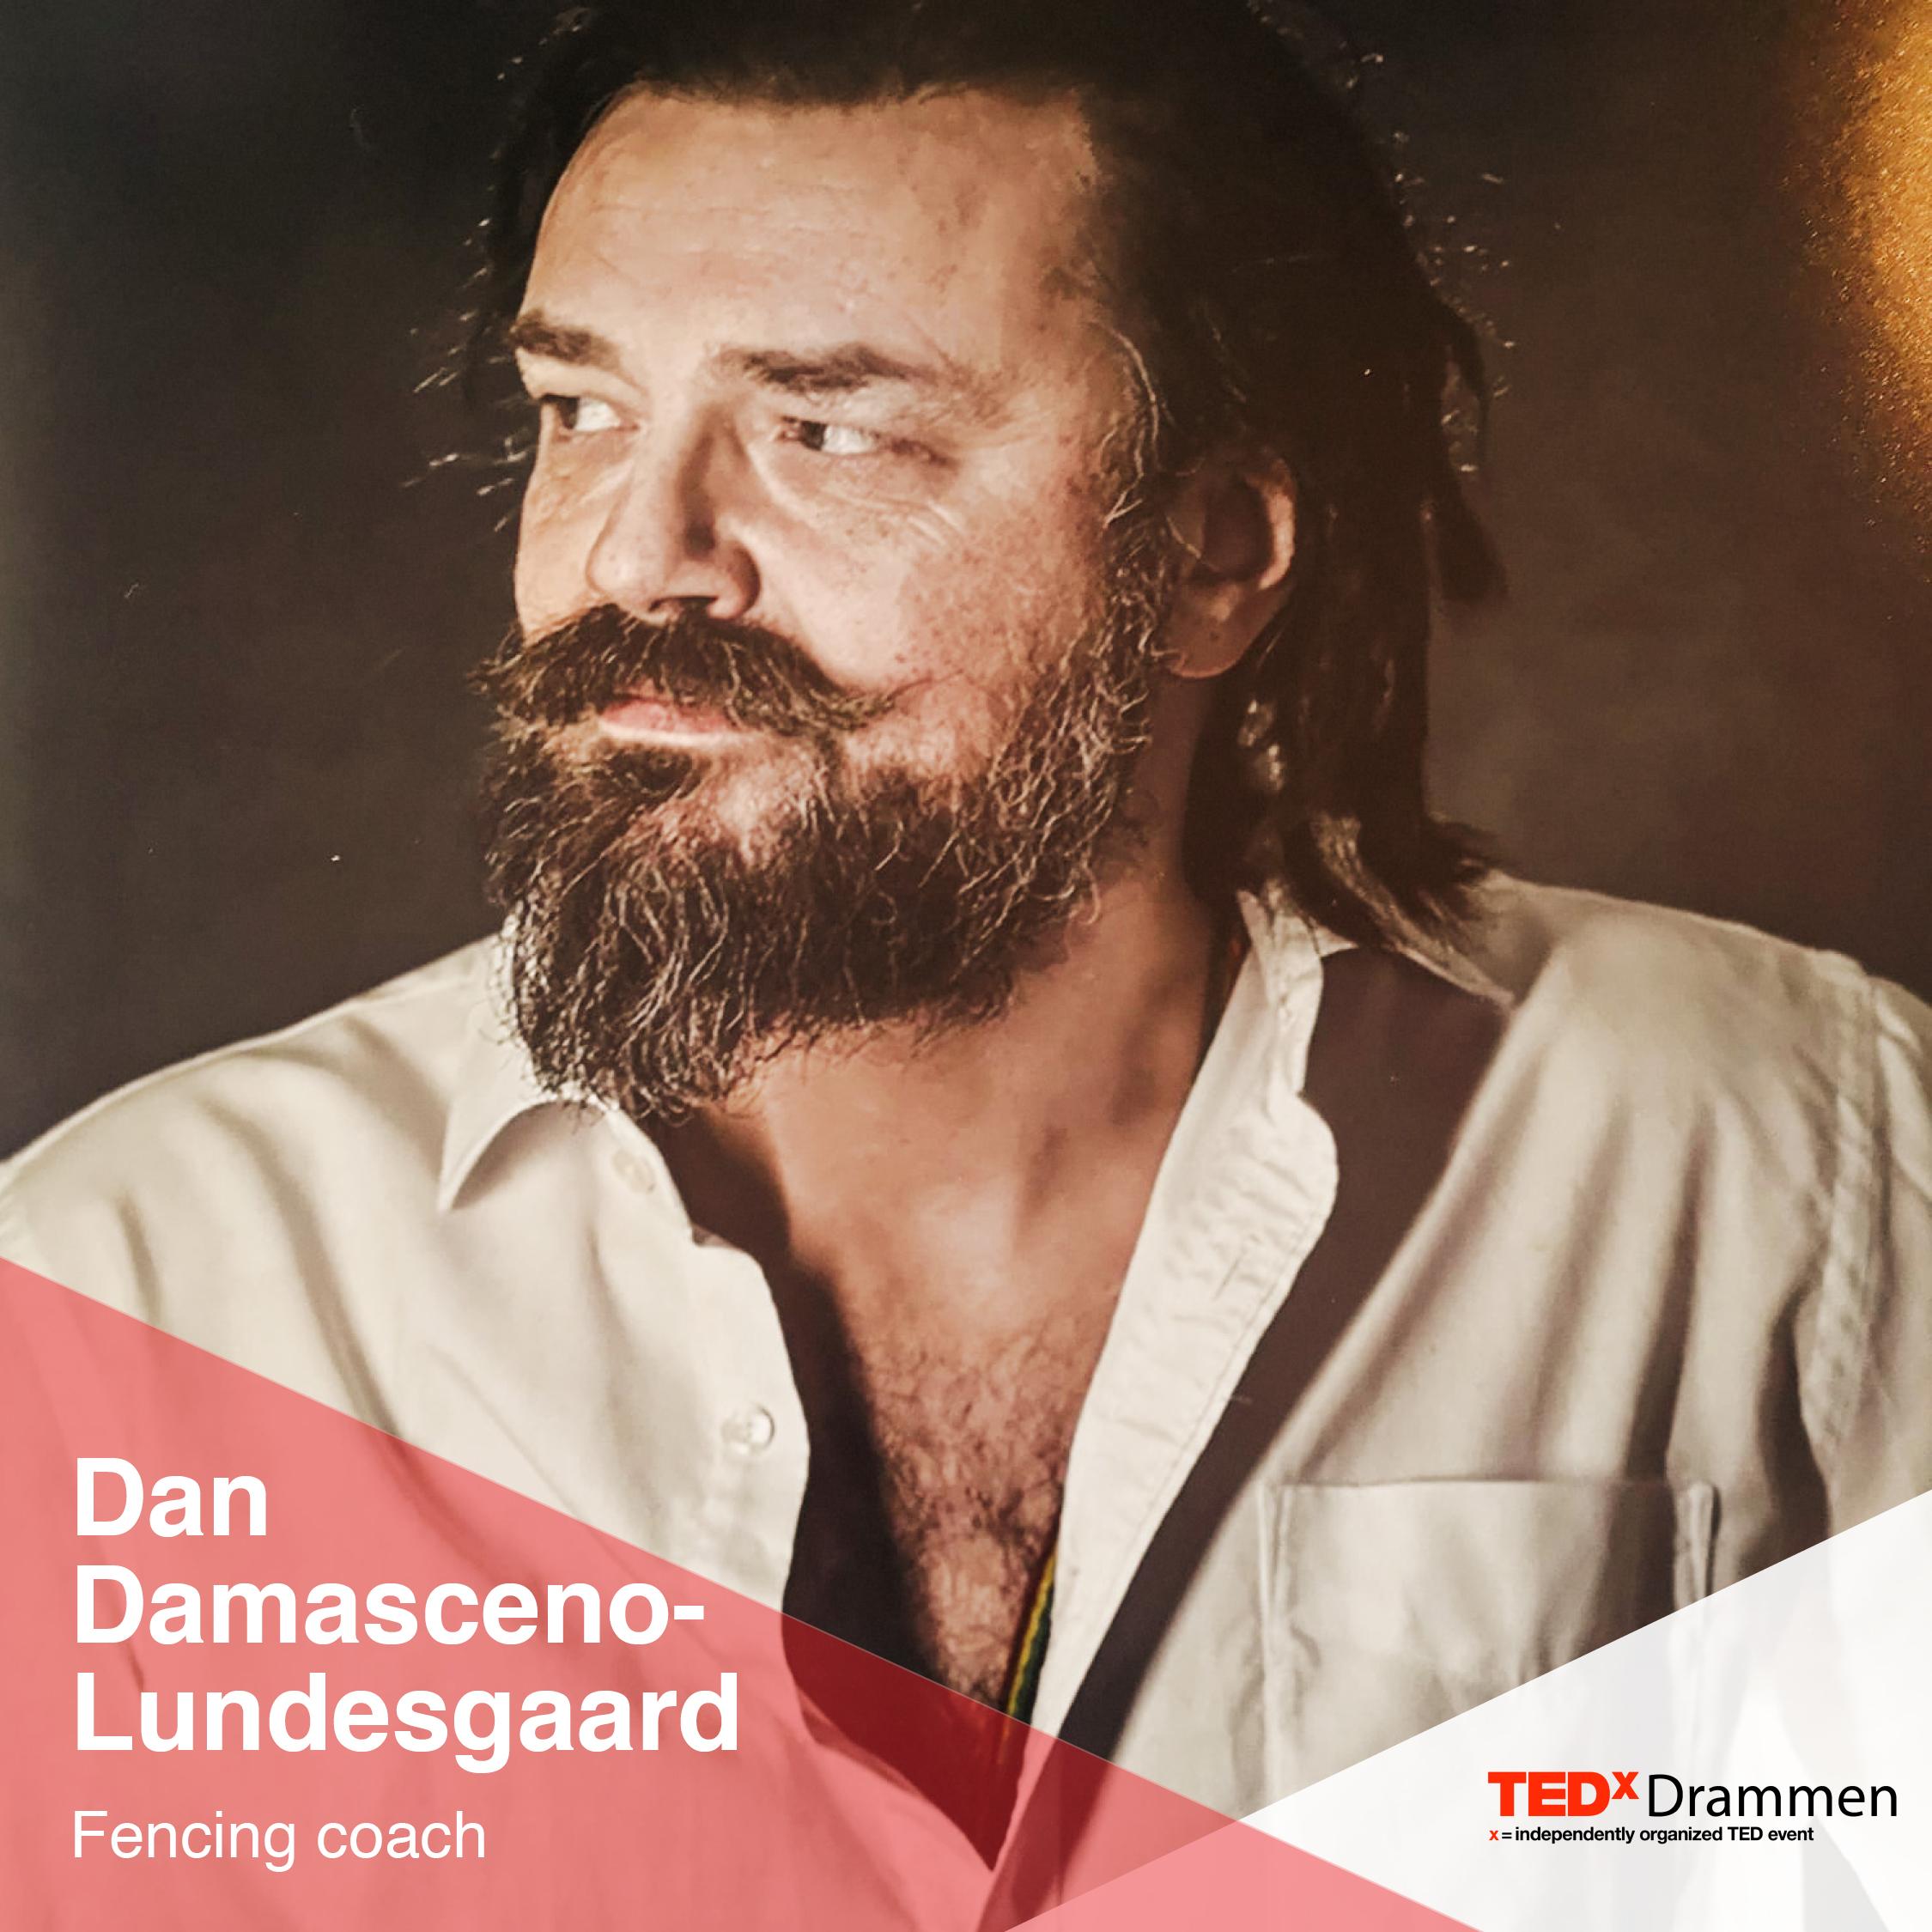 Dan Damasceno-Lundesgaard